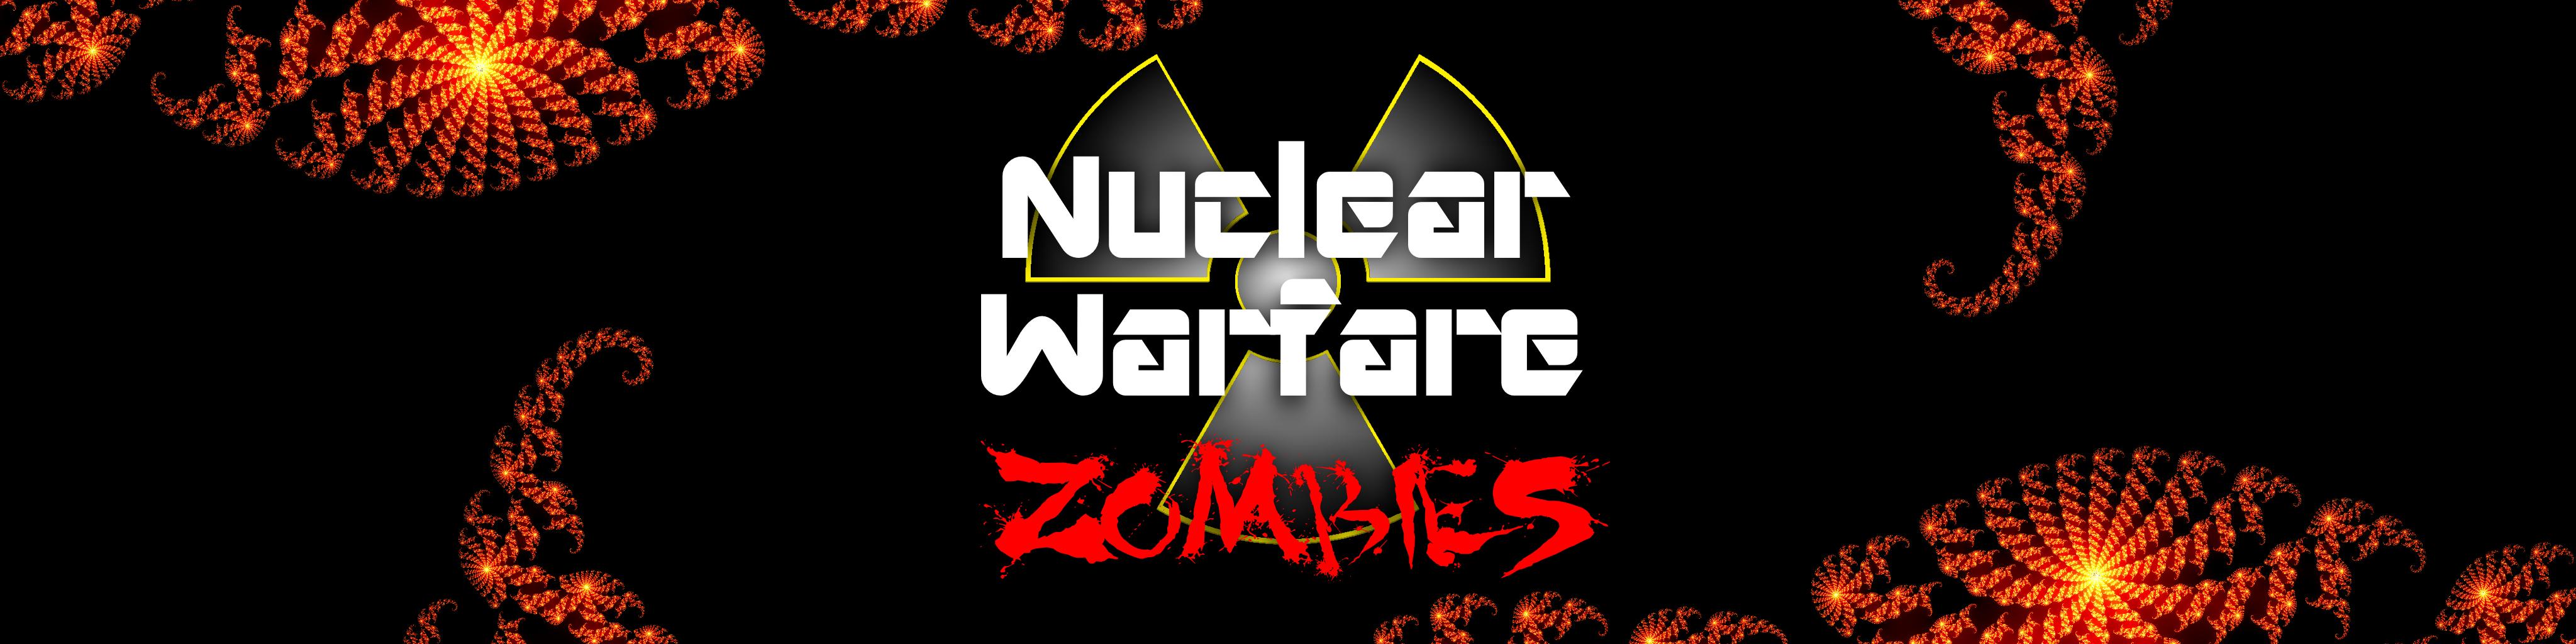 Nuclear Warfare Testing Beta